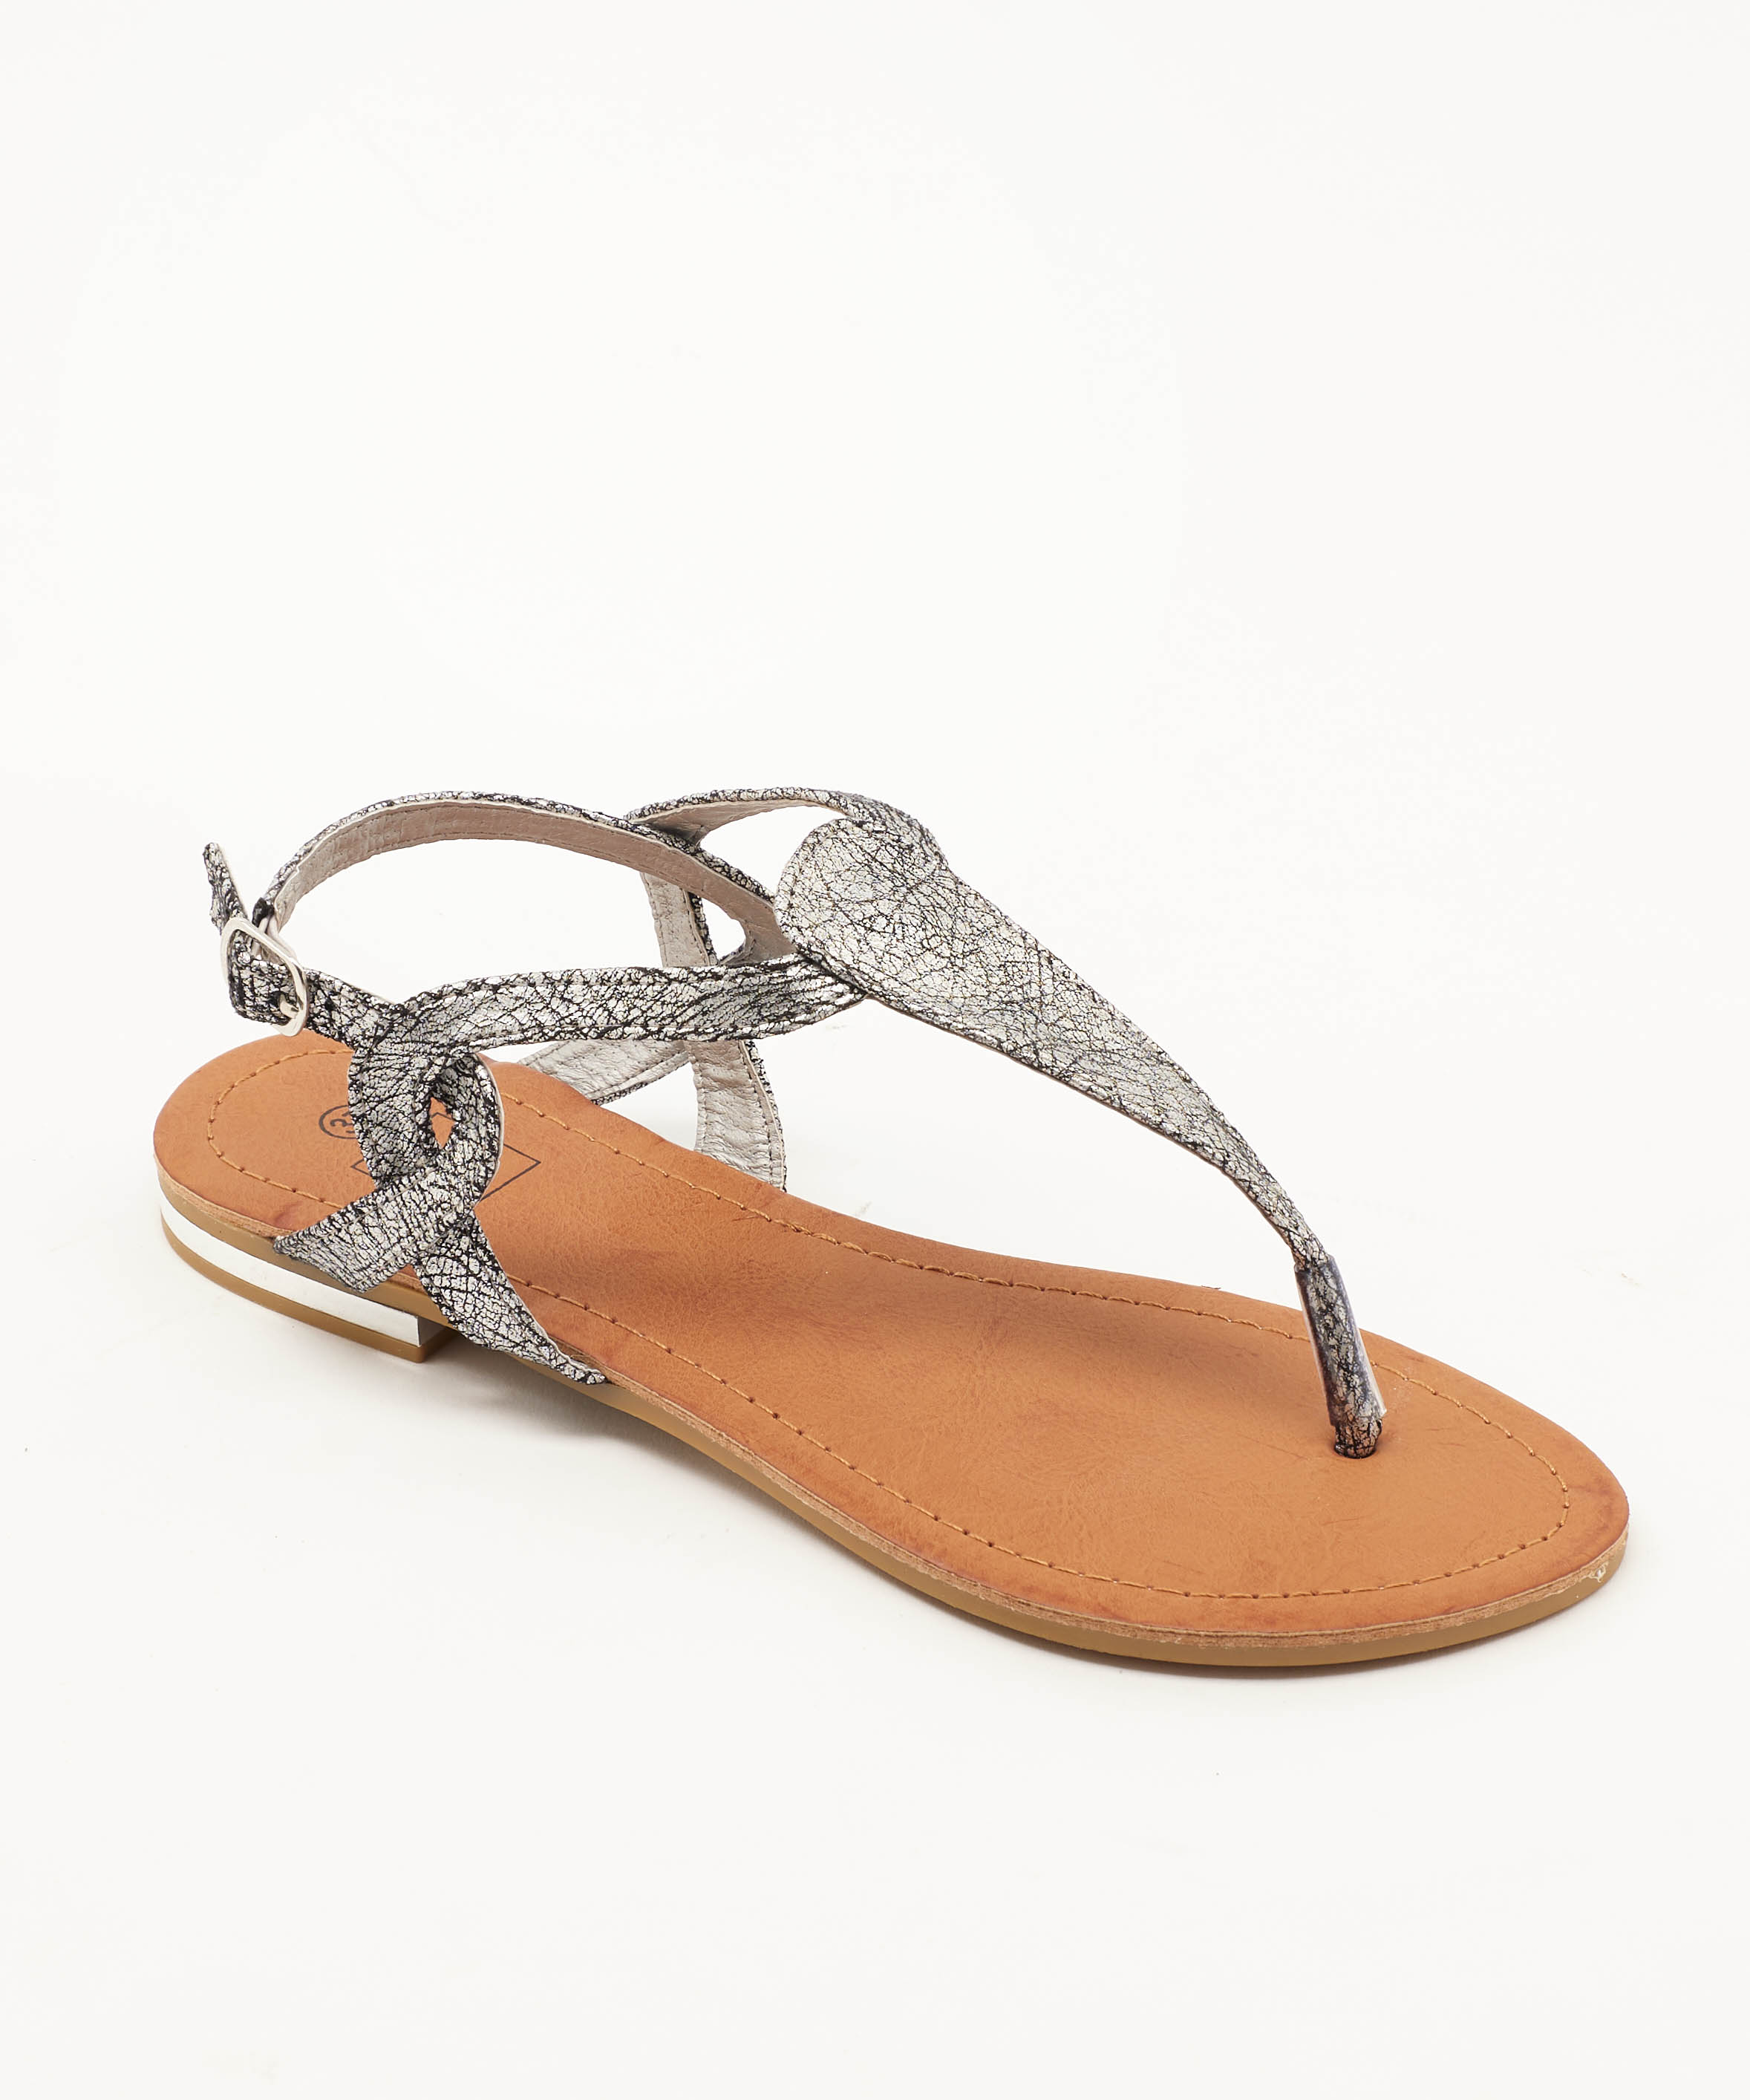 Sandales Plates Femme - Sandale Plate Argent Jina - Naema